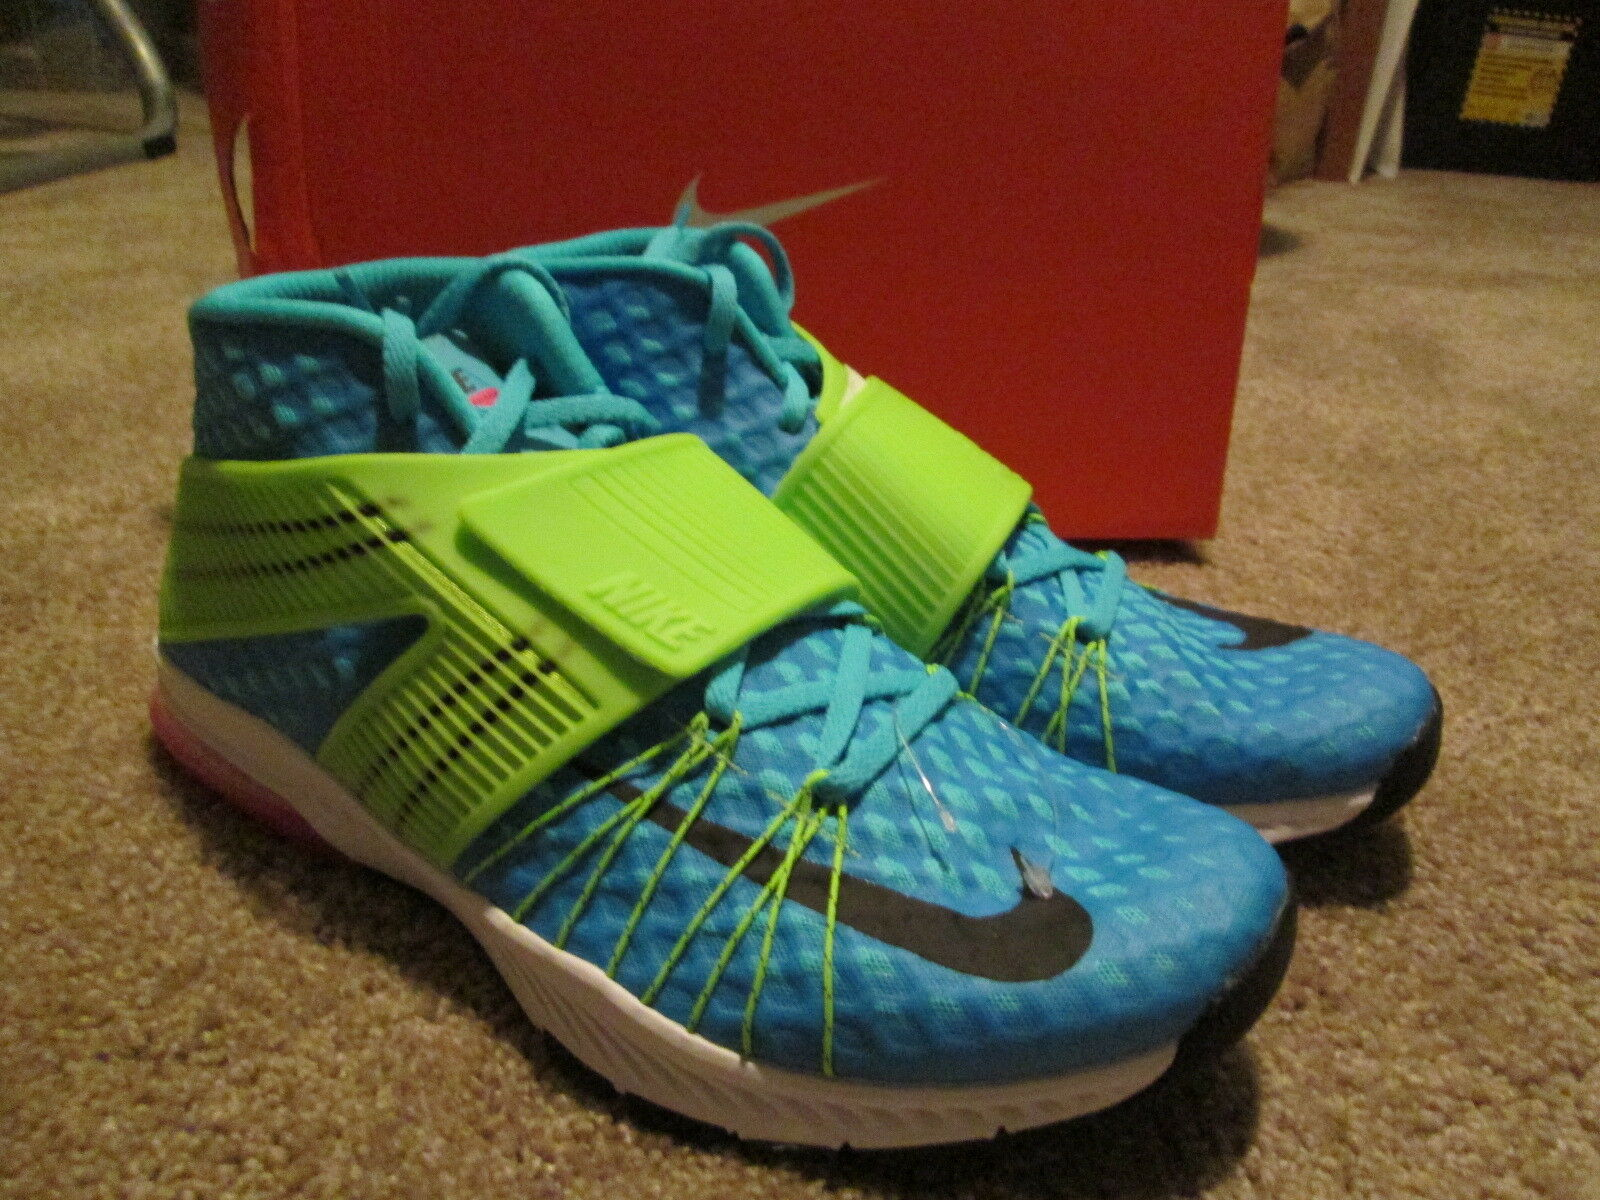 NEW Mens Nike Zoom Train Toranada Gamma Blue/Electric Green/Pink 11 FREE SHIP